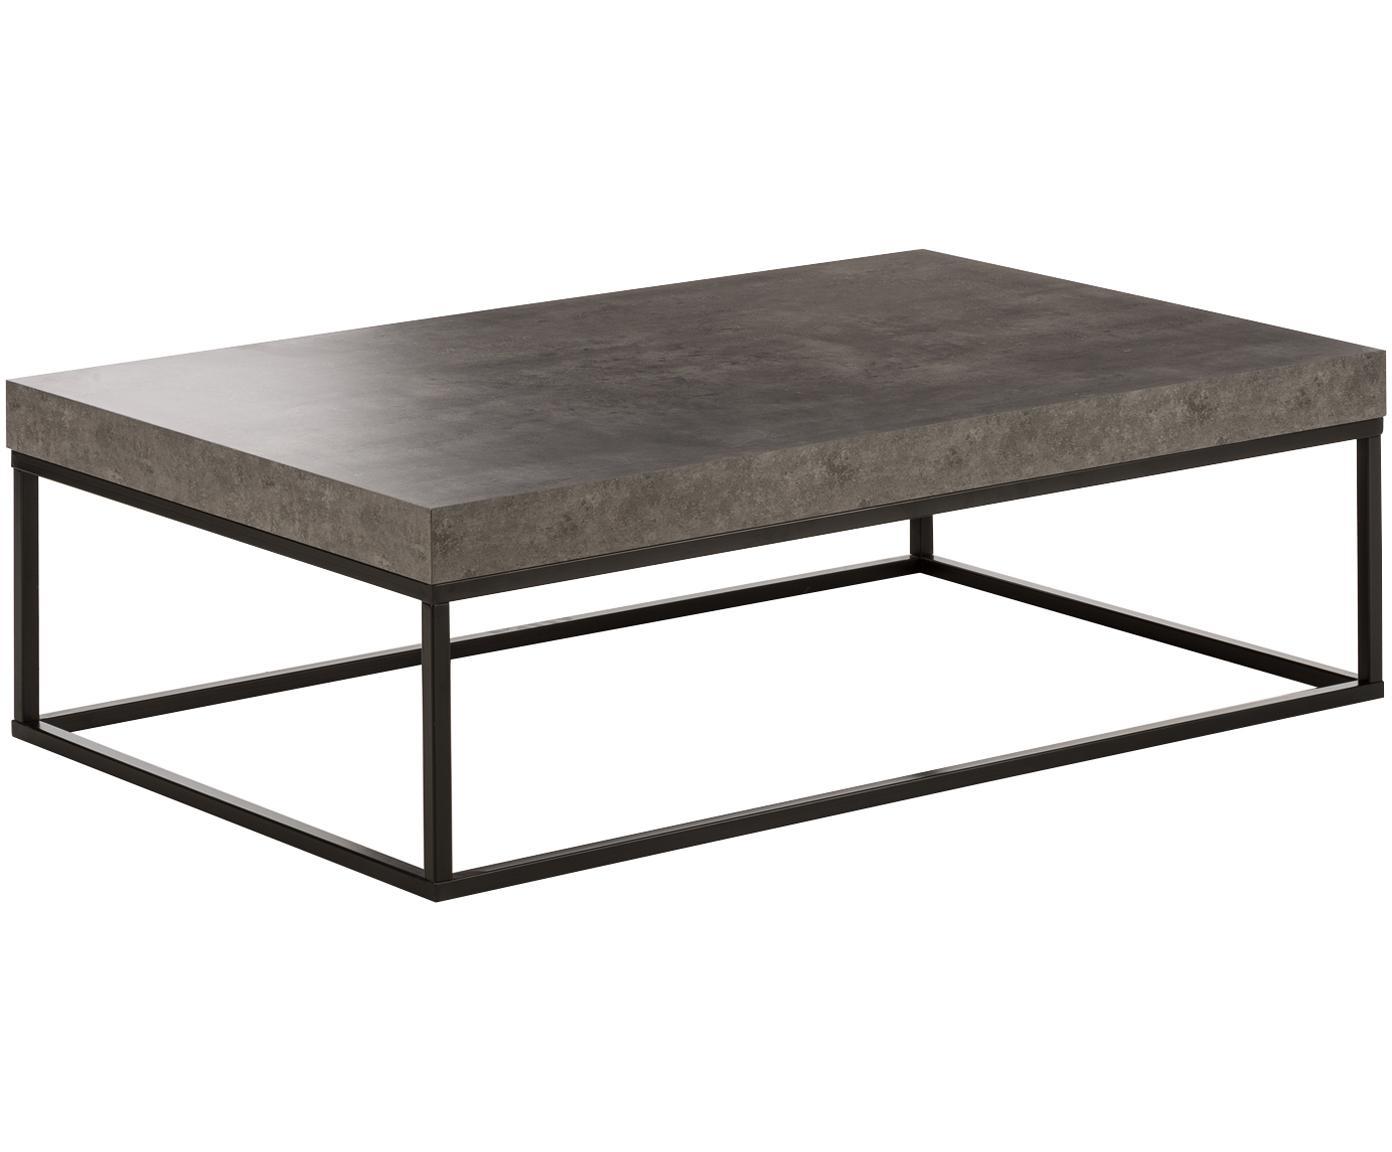 Mesa de centro en cemento Ellis, Tablero: estructura ligera de pana, Estructura: metal pintado, Negro, imitación de cemento, An 120 x F 75 cm